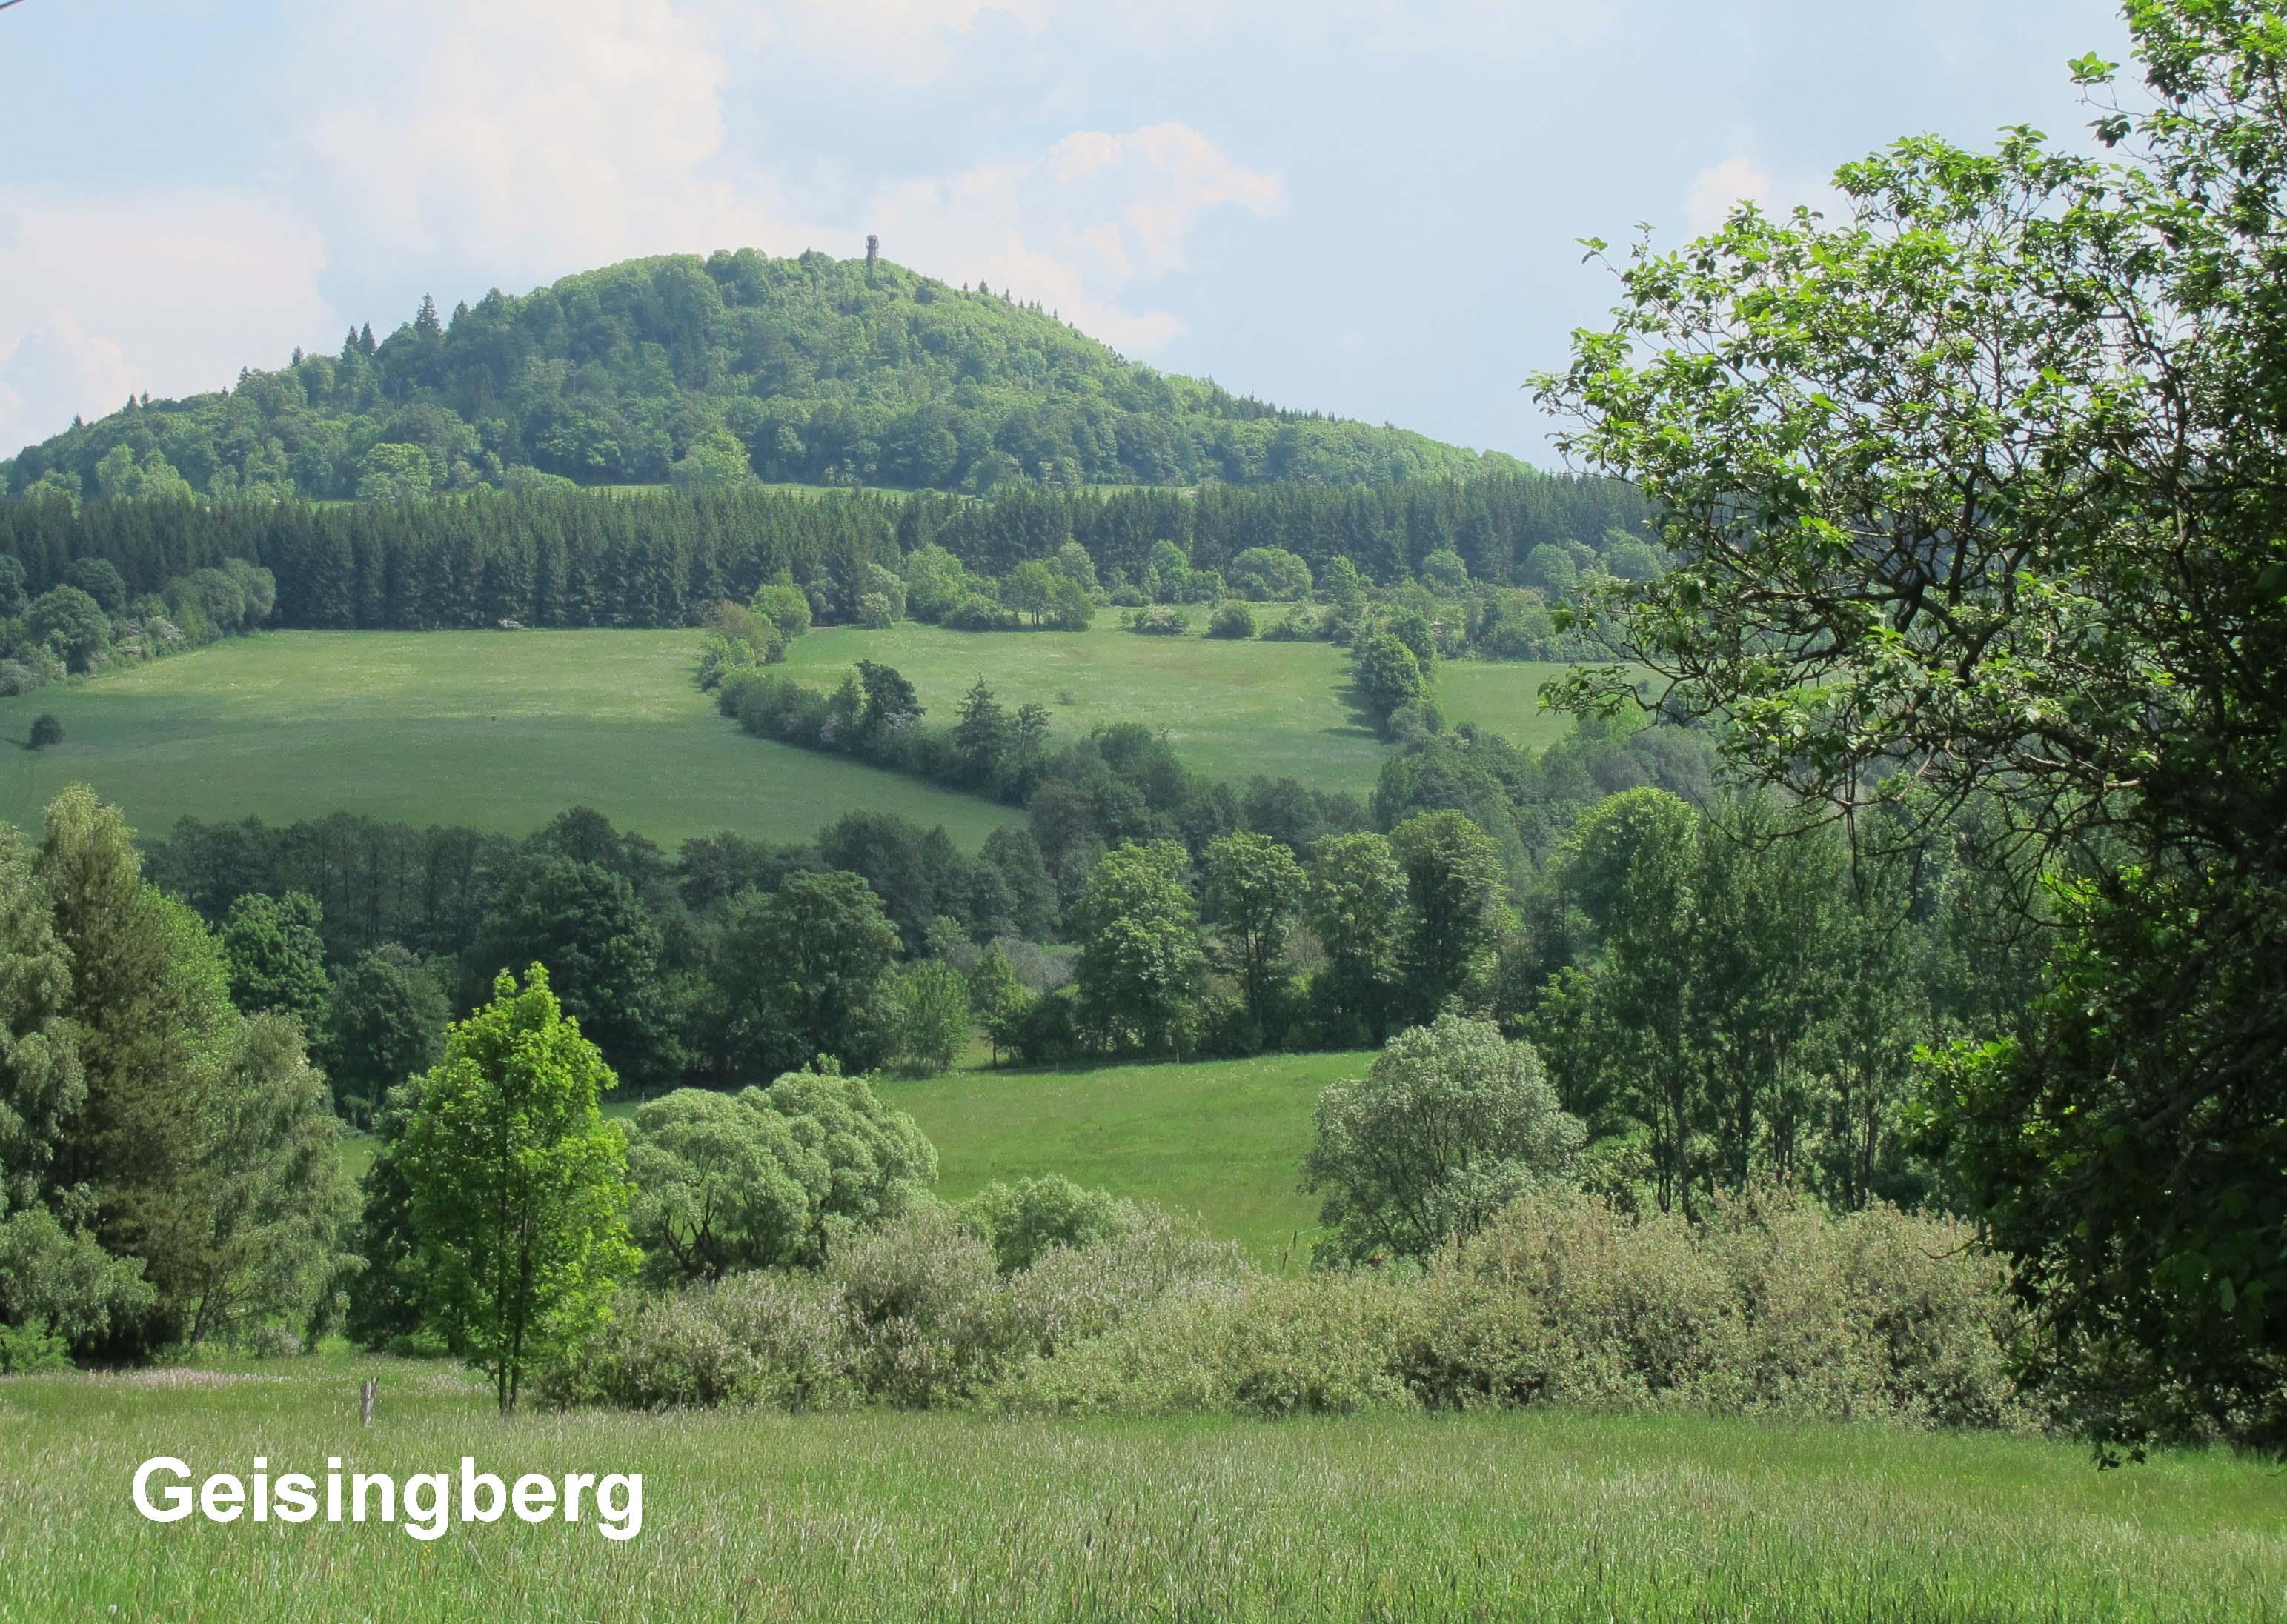 3 - Geisingberg